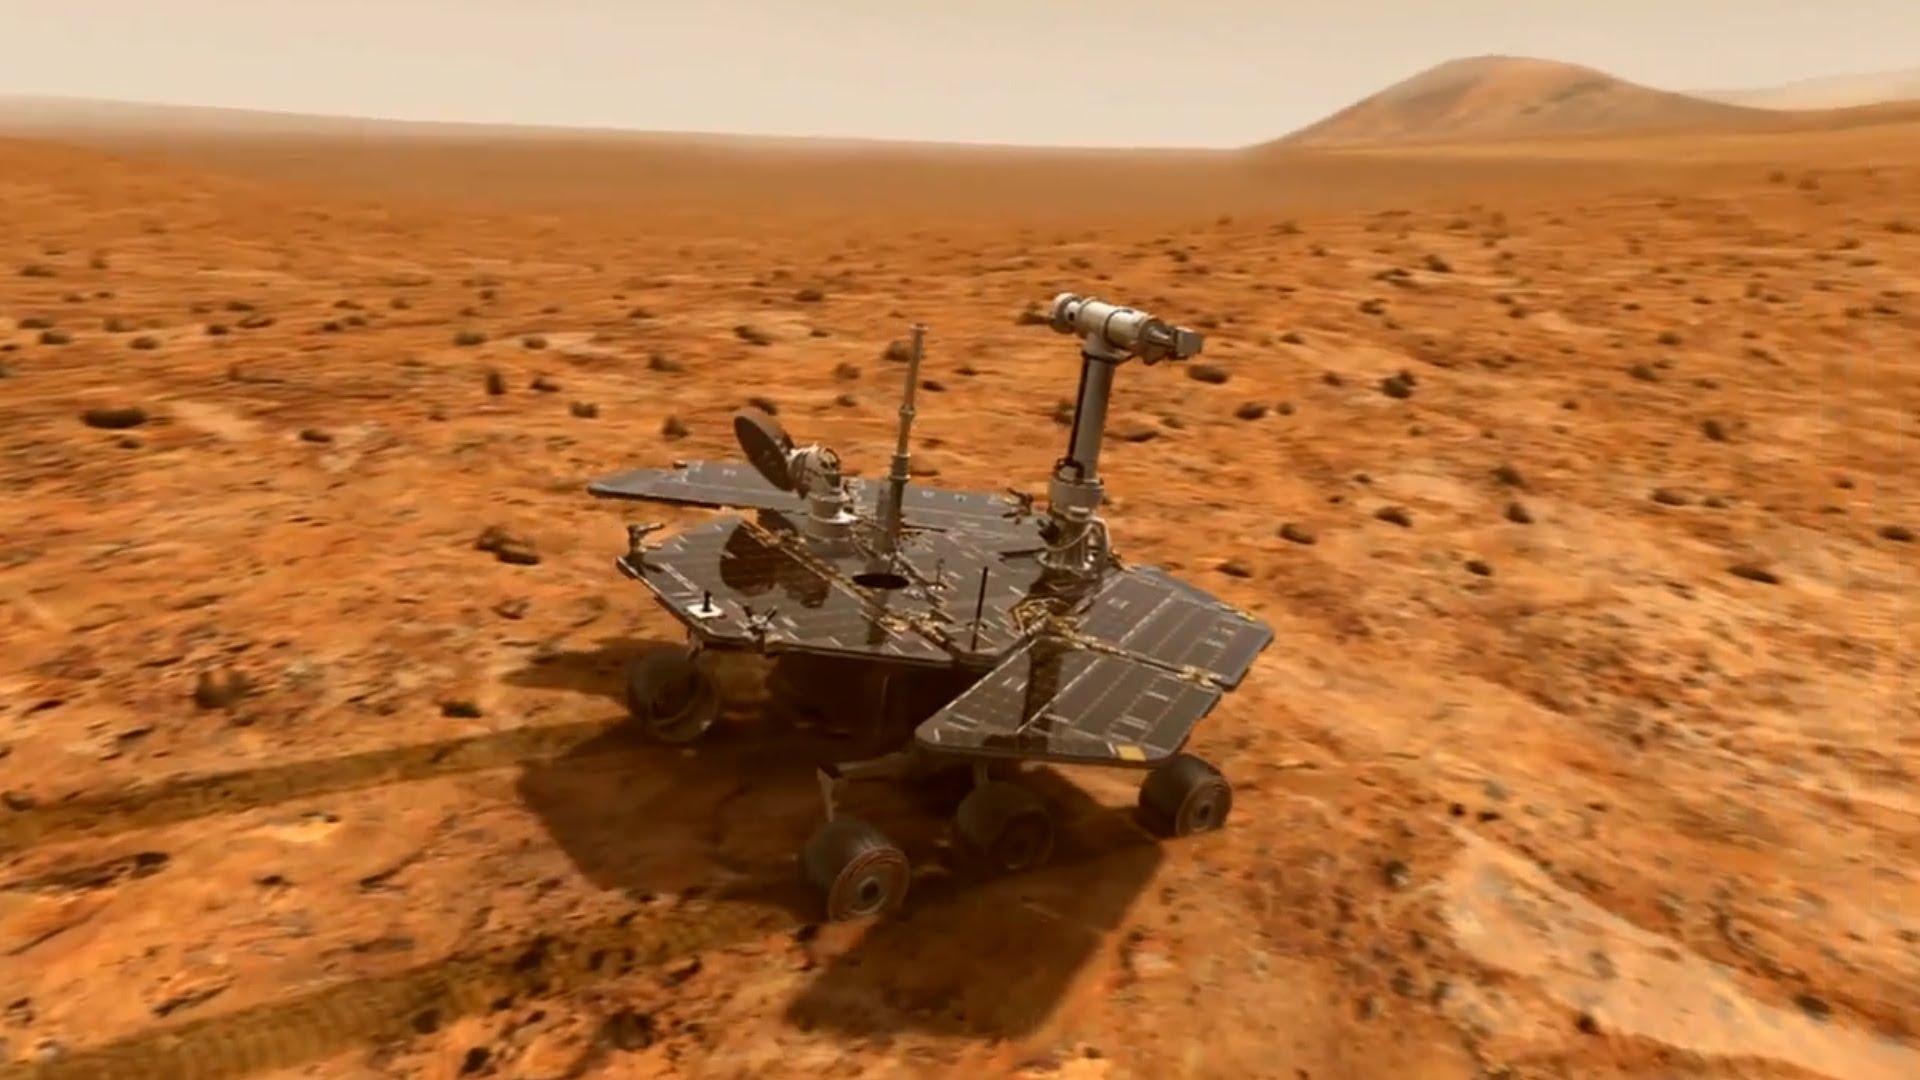 Марсоход Opportunity займется изучением кратера Индевор